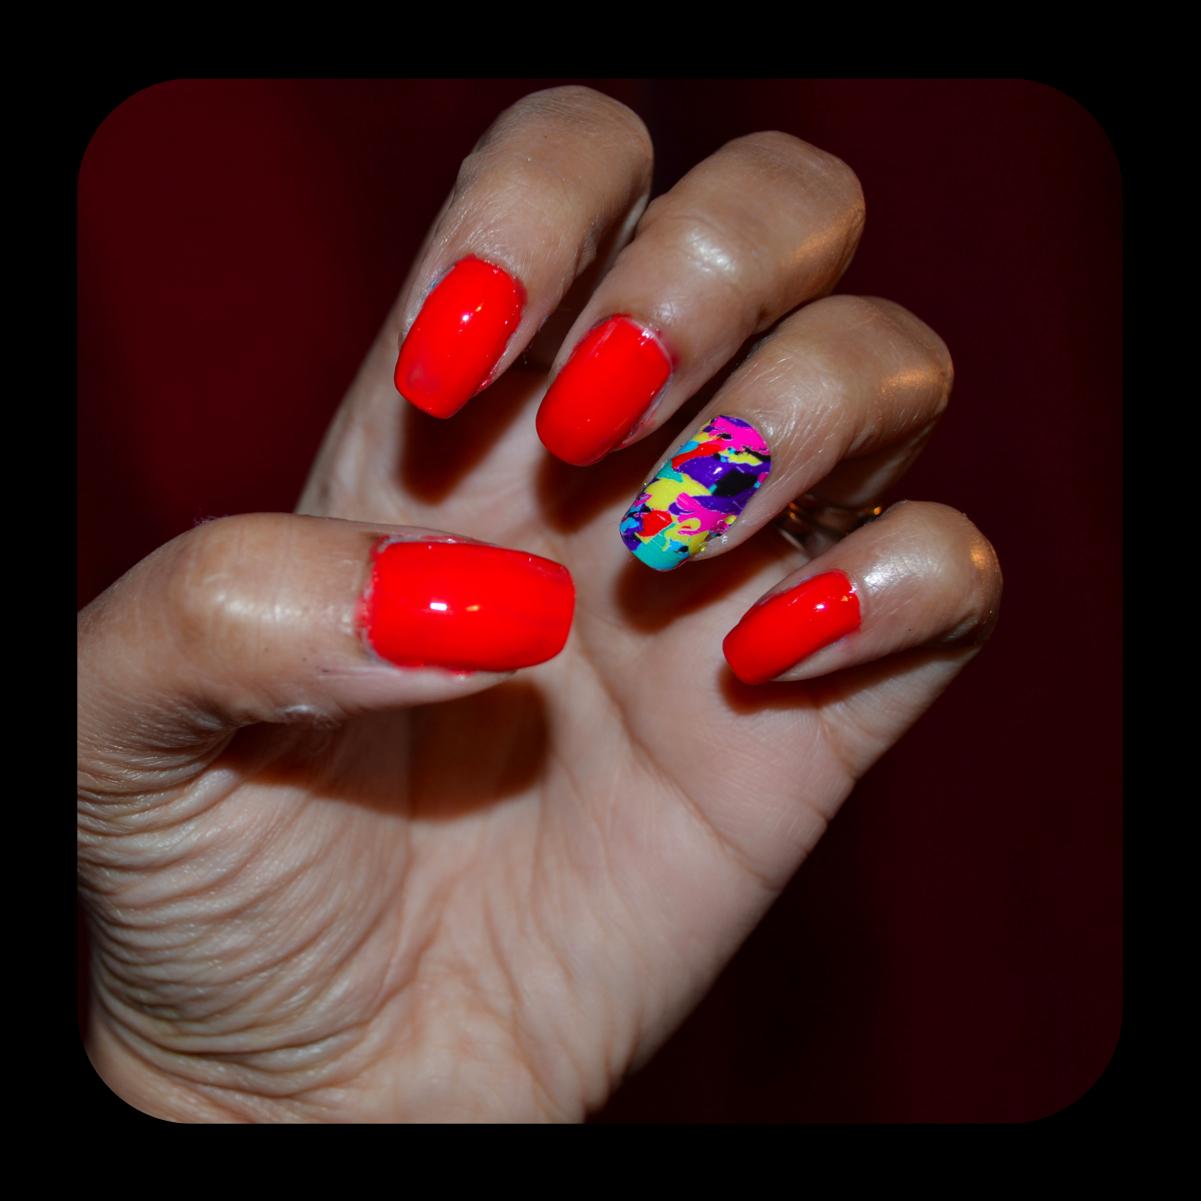 Tumblr Stiletto Nails   Joy Studio Design Gallery - Best ...